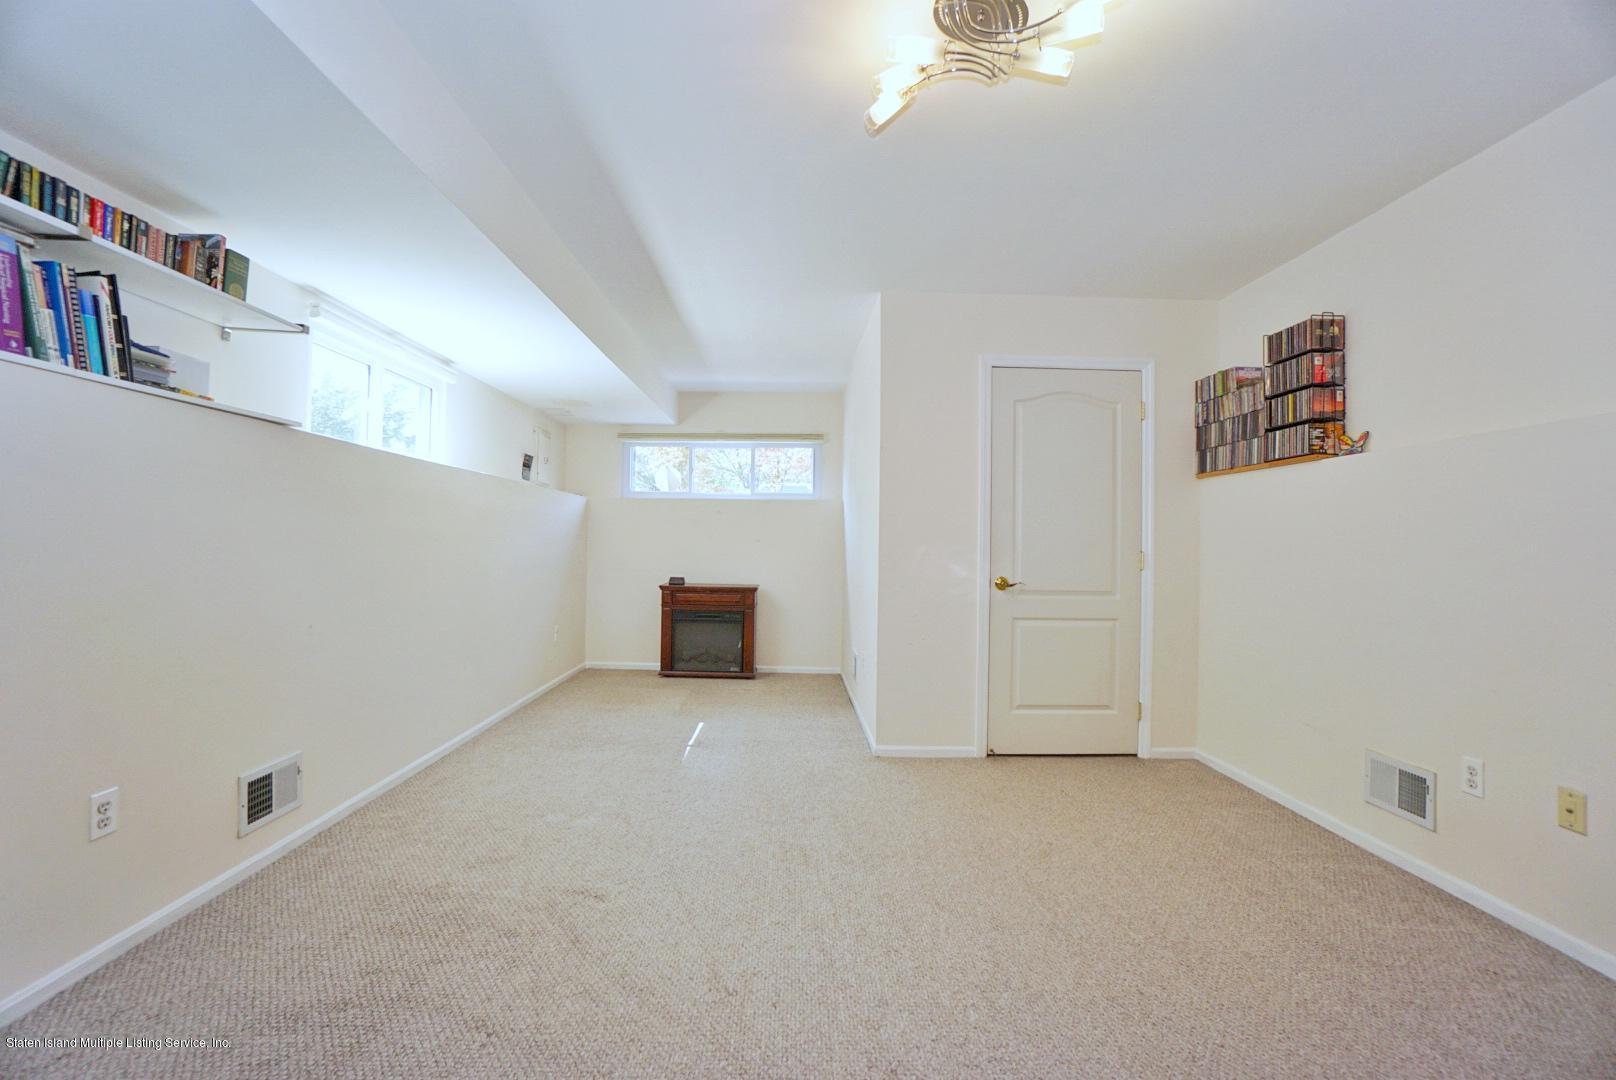 Single Family - Semi-Attached 18 Dunhill Lane  Staten Island, NY 10309, MLS-1139055-31